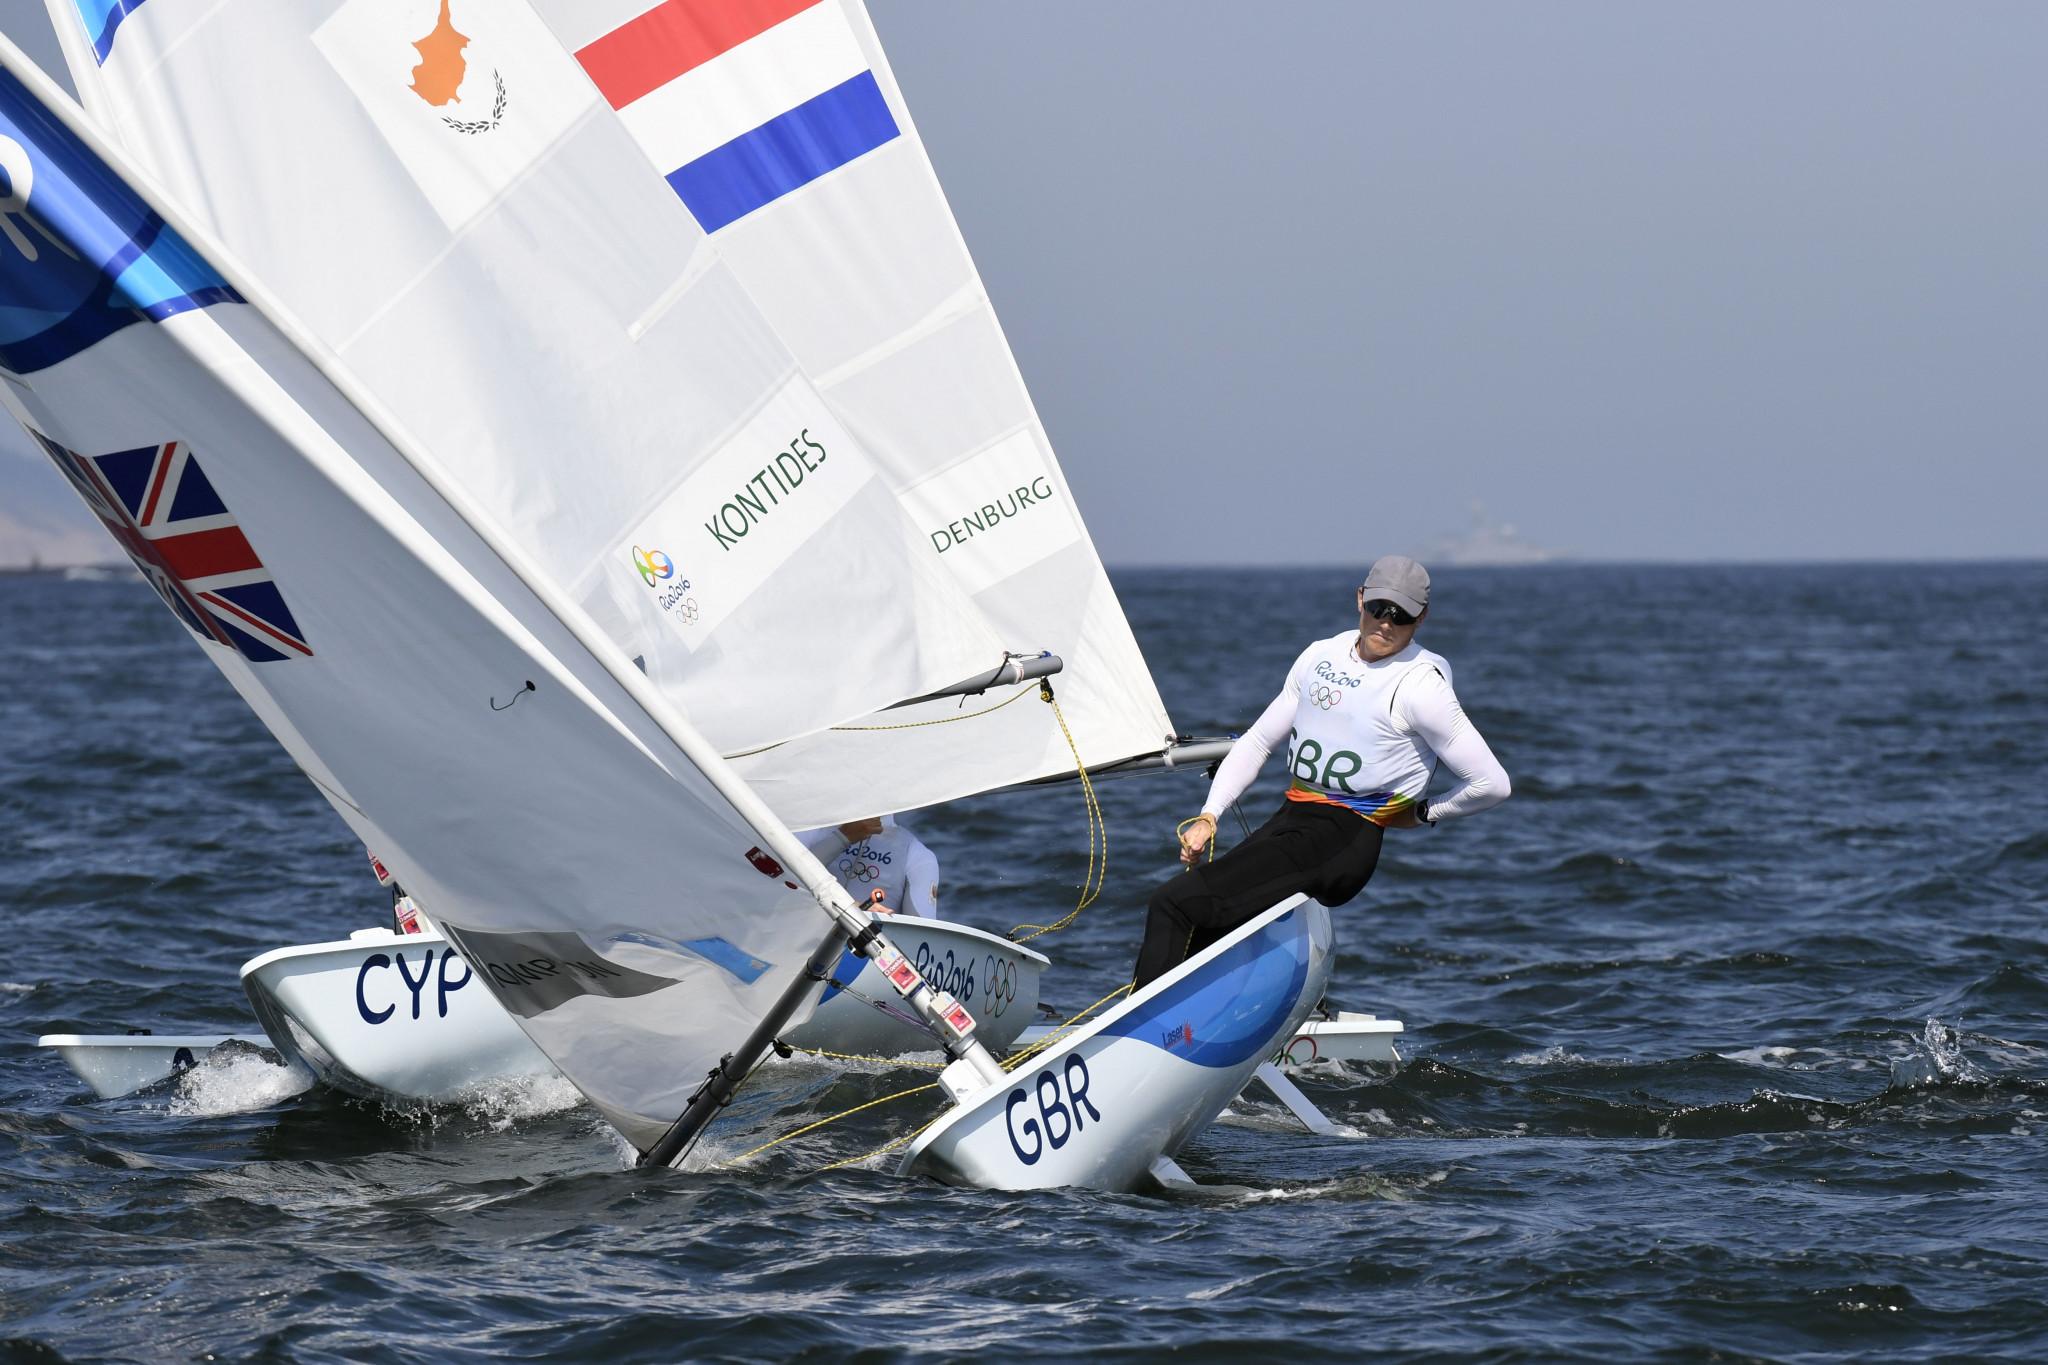 Trio seek to defend titles at Laser European Championships